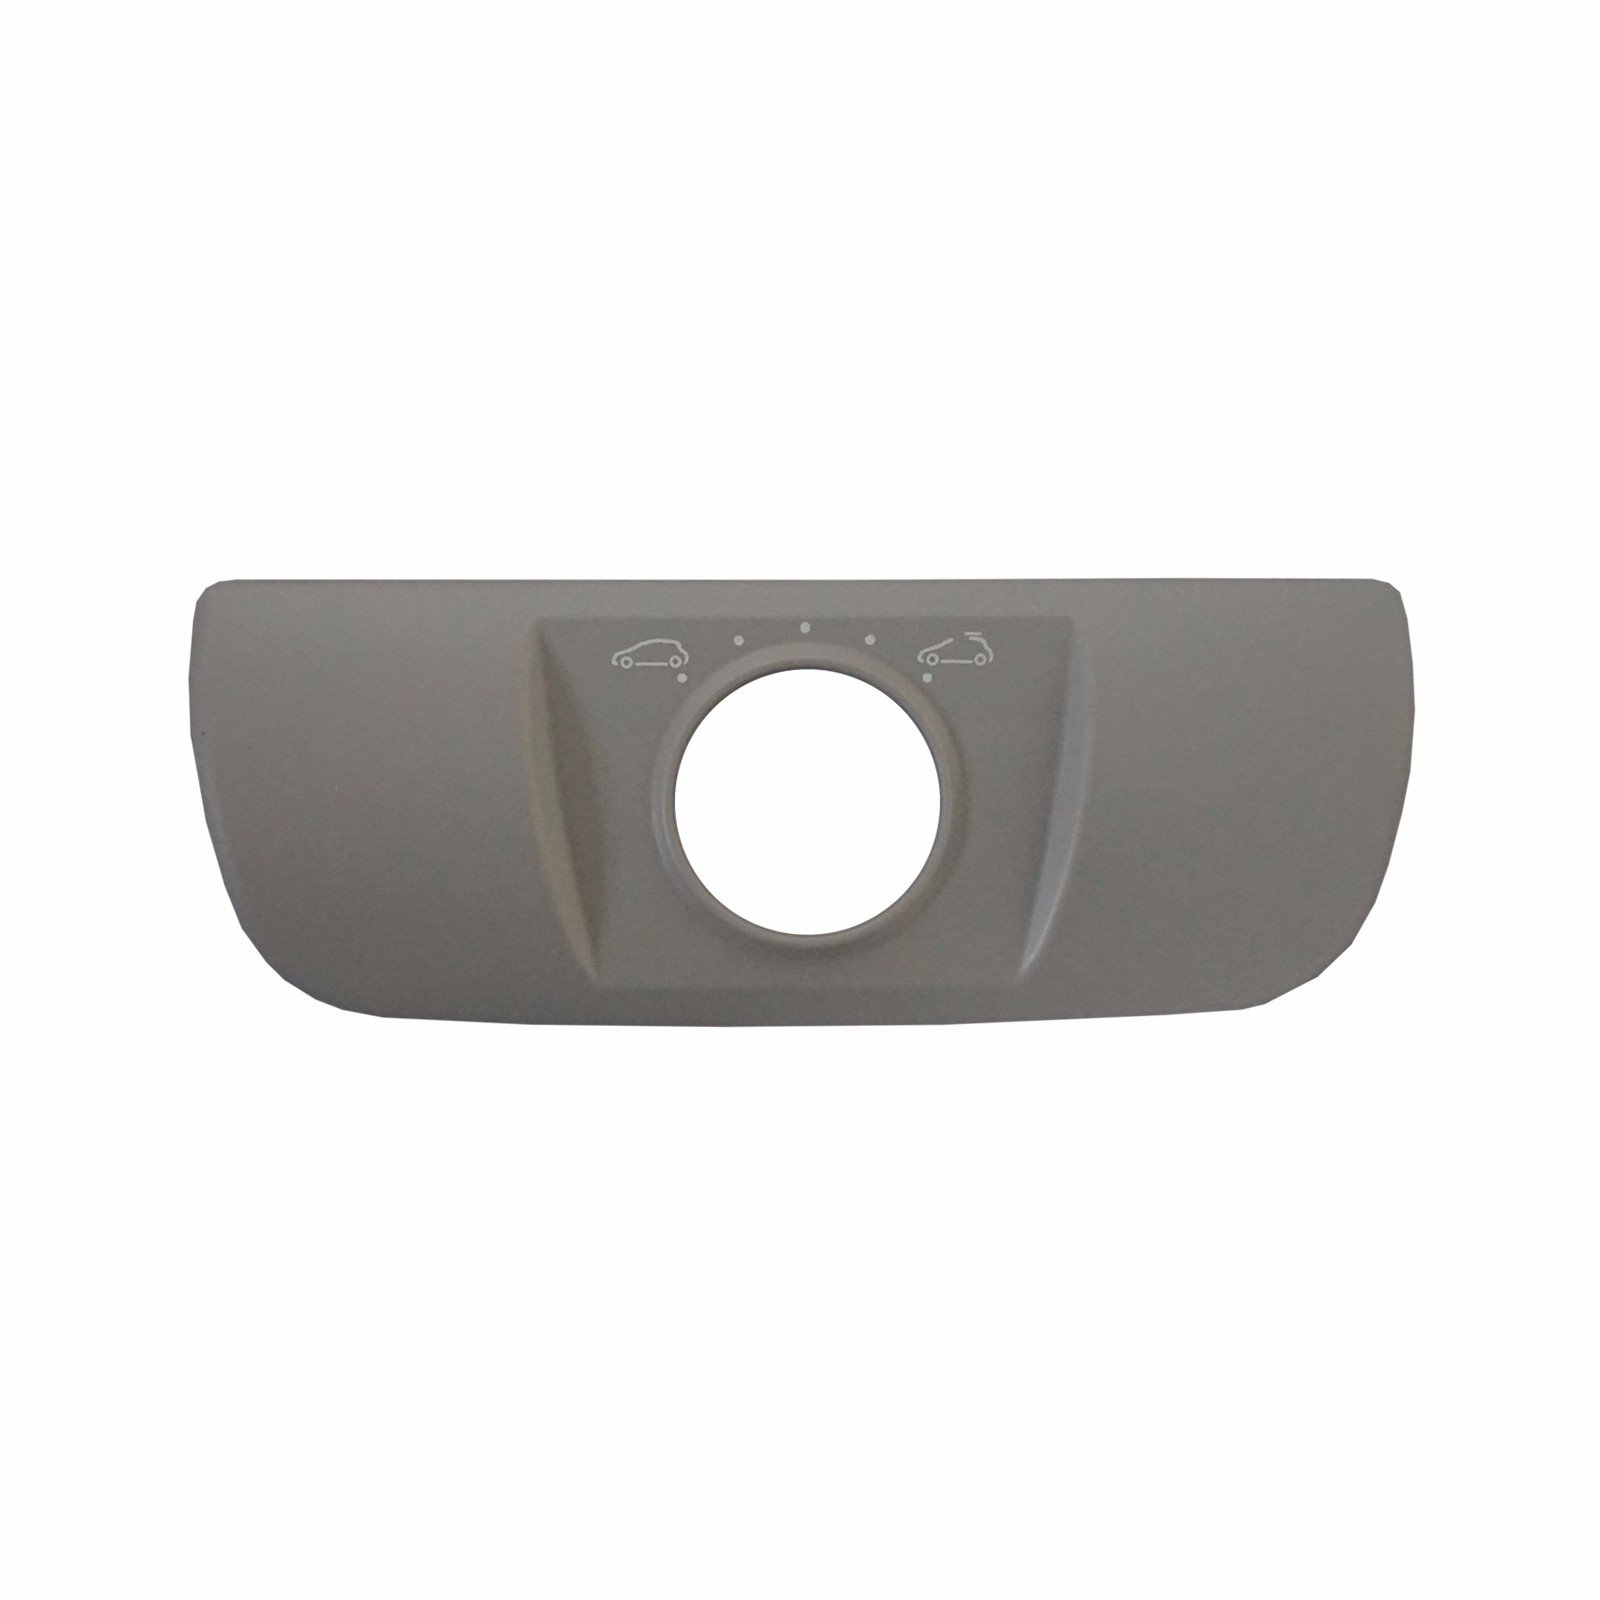 Bross BSR528 Sunroof Control Switch Panel Frame: 8200119893 Beige Color for Renault Megane Scenic Laguna 2